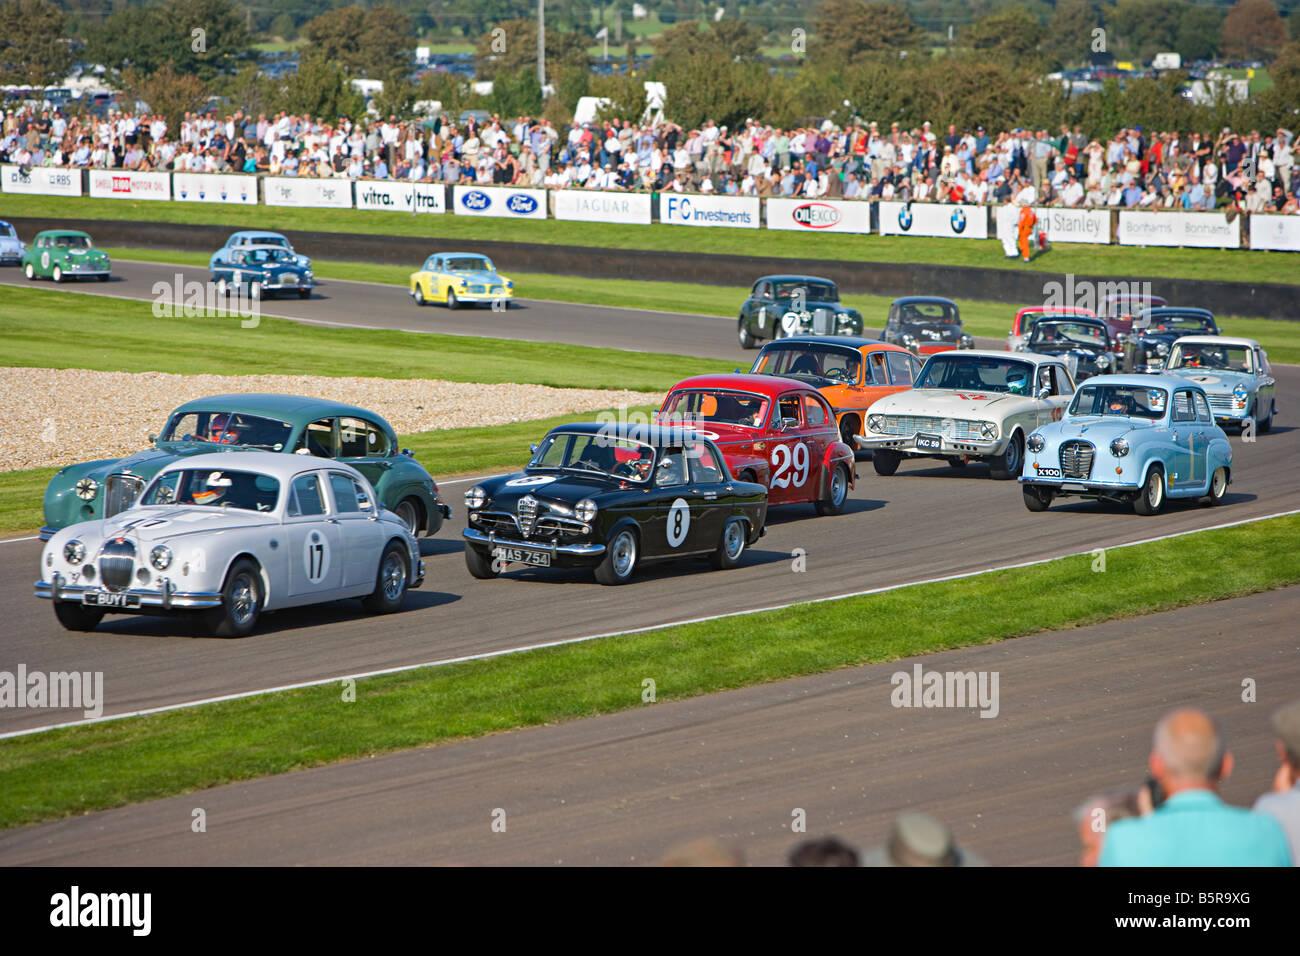 Auto classica gara a Goodwood, Goodwood, West Sussex. Foto Stock